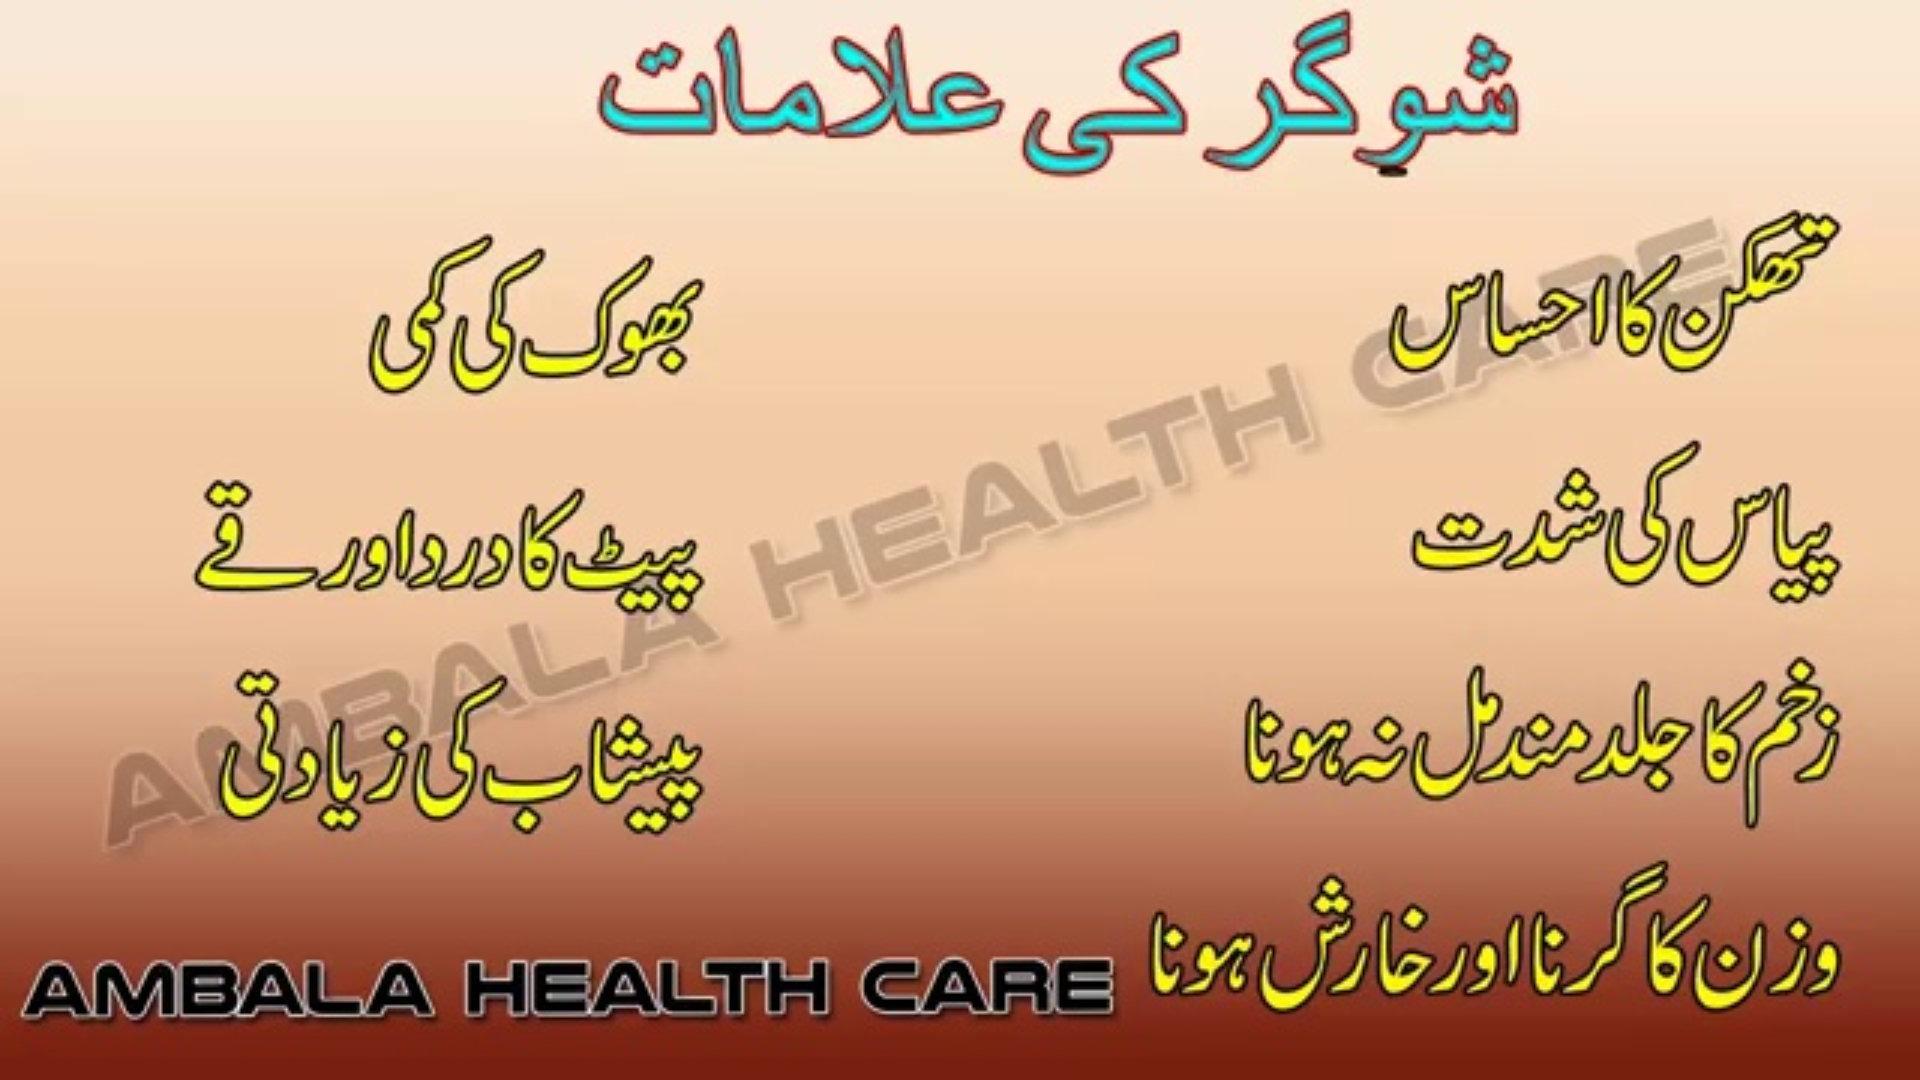 sugar ka ilaaj, diabetes, IME9, Sugar medicine, how to treat sugar, sugar patient, high sugar, low sugar, sugar treatment